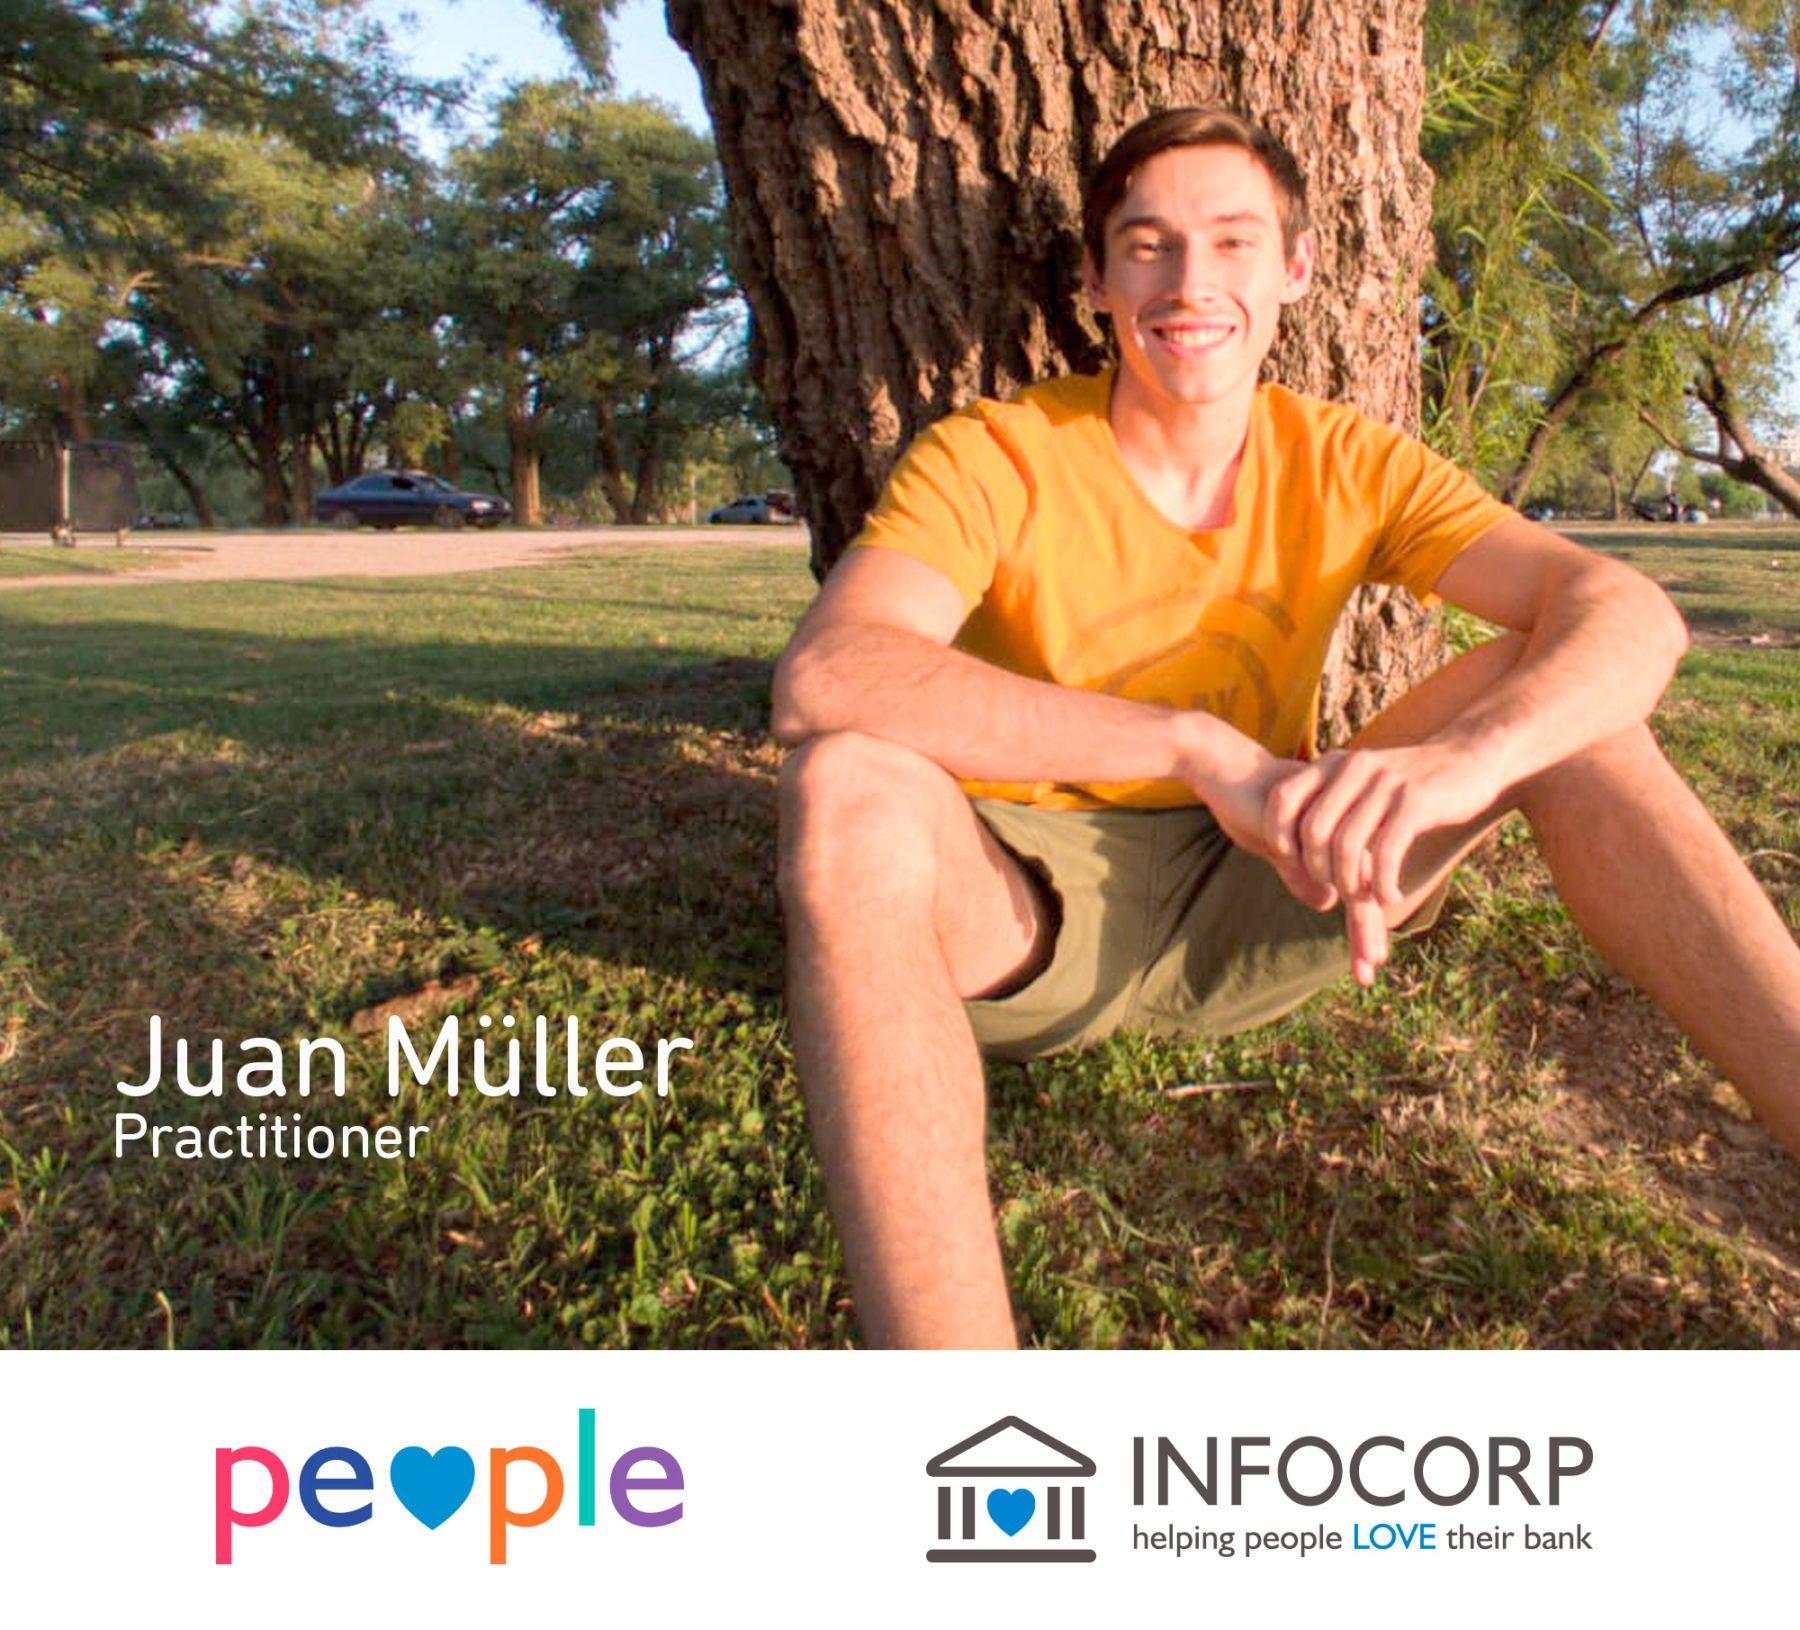 INFOCORP-JuanMüller